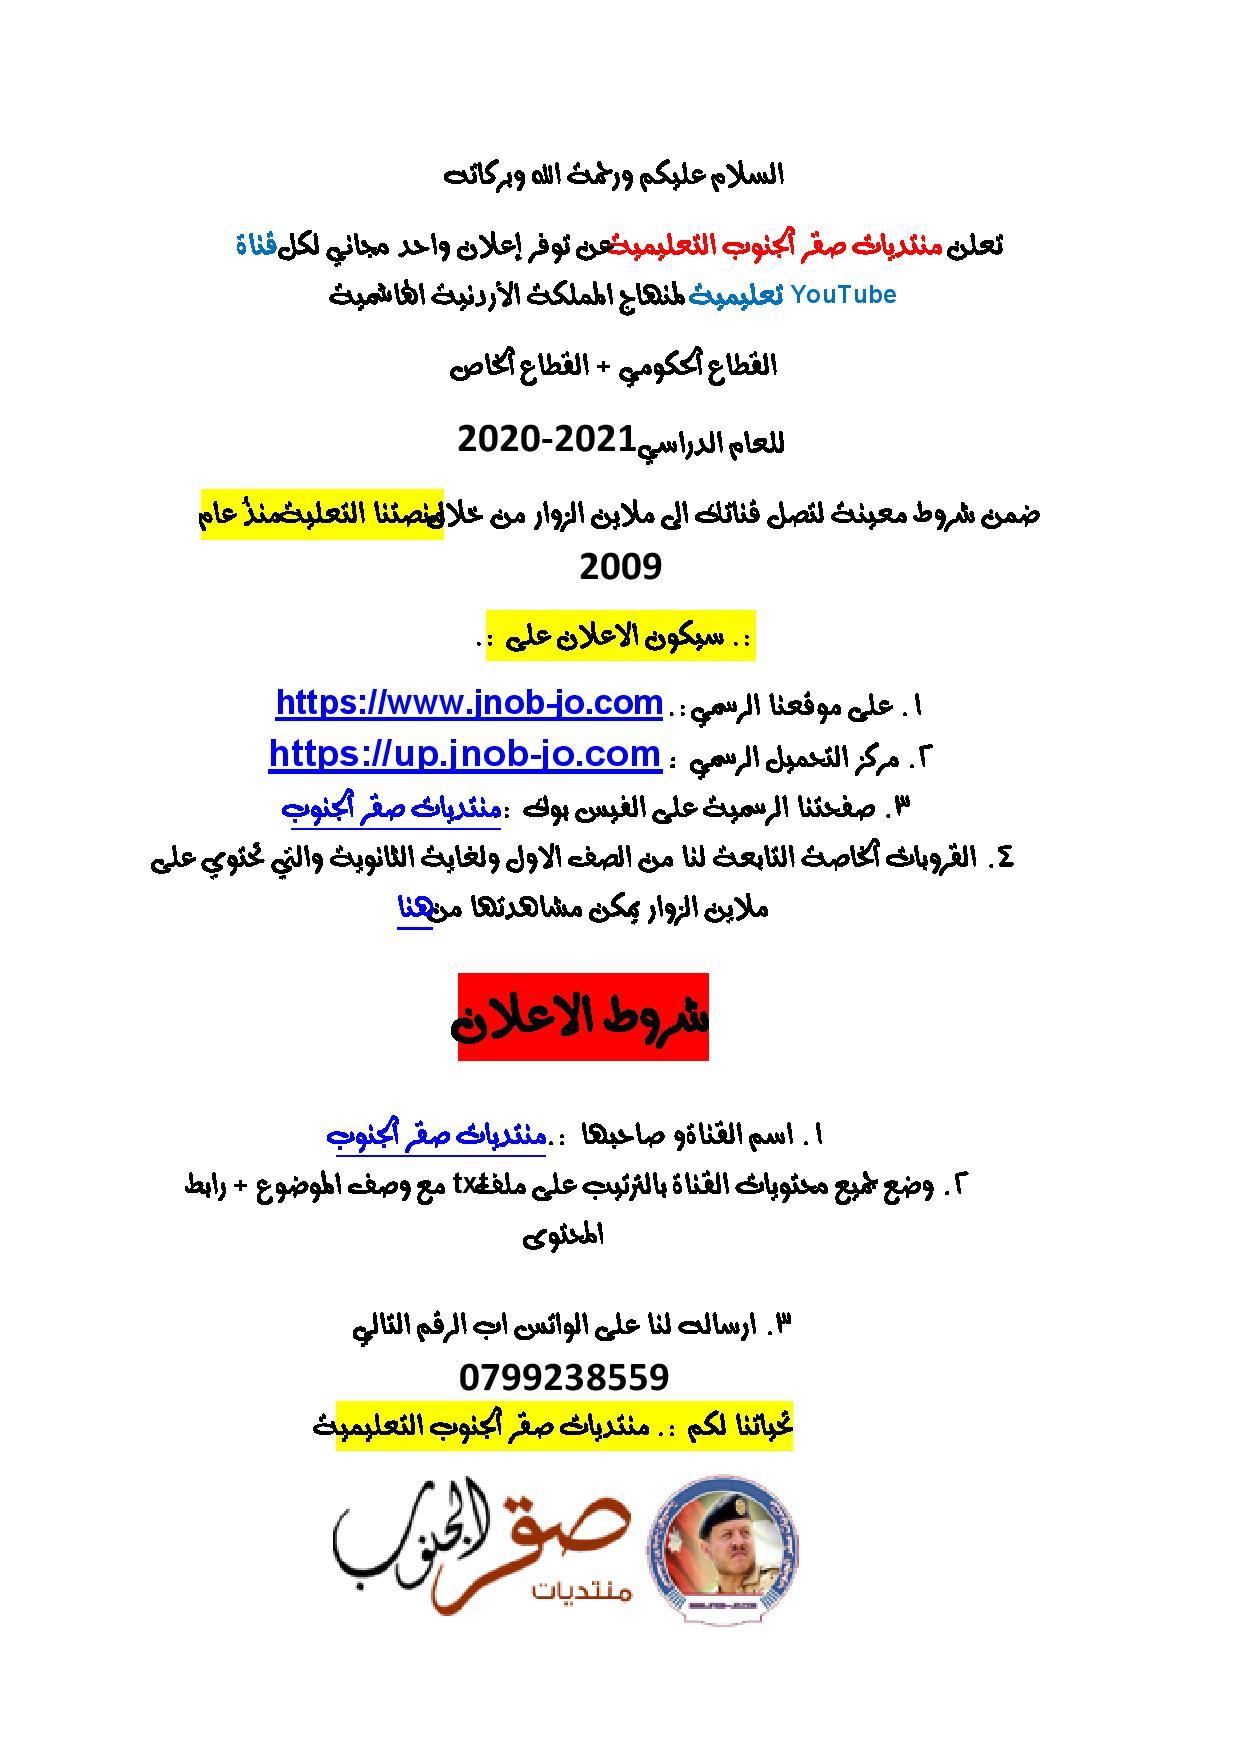 YouTube الأردنية الدراسي 2020-2021 do.php?img=48505